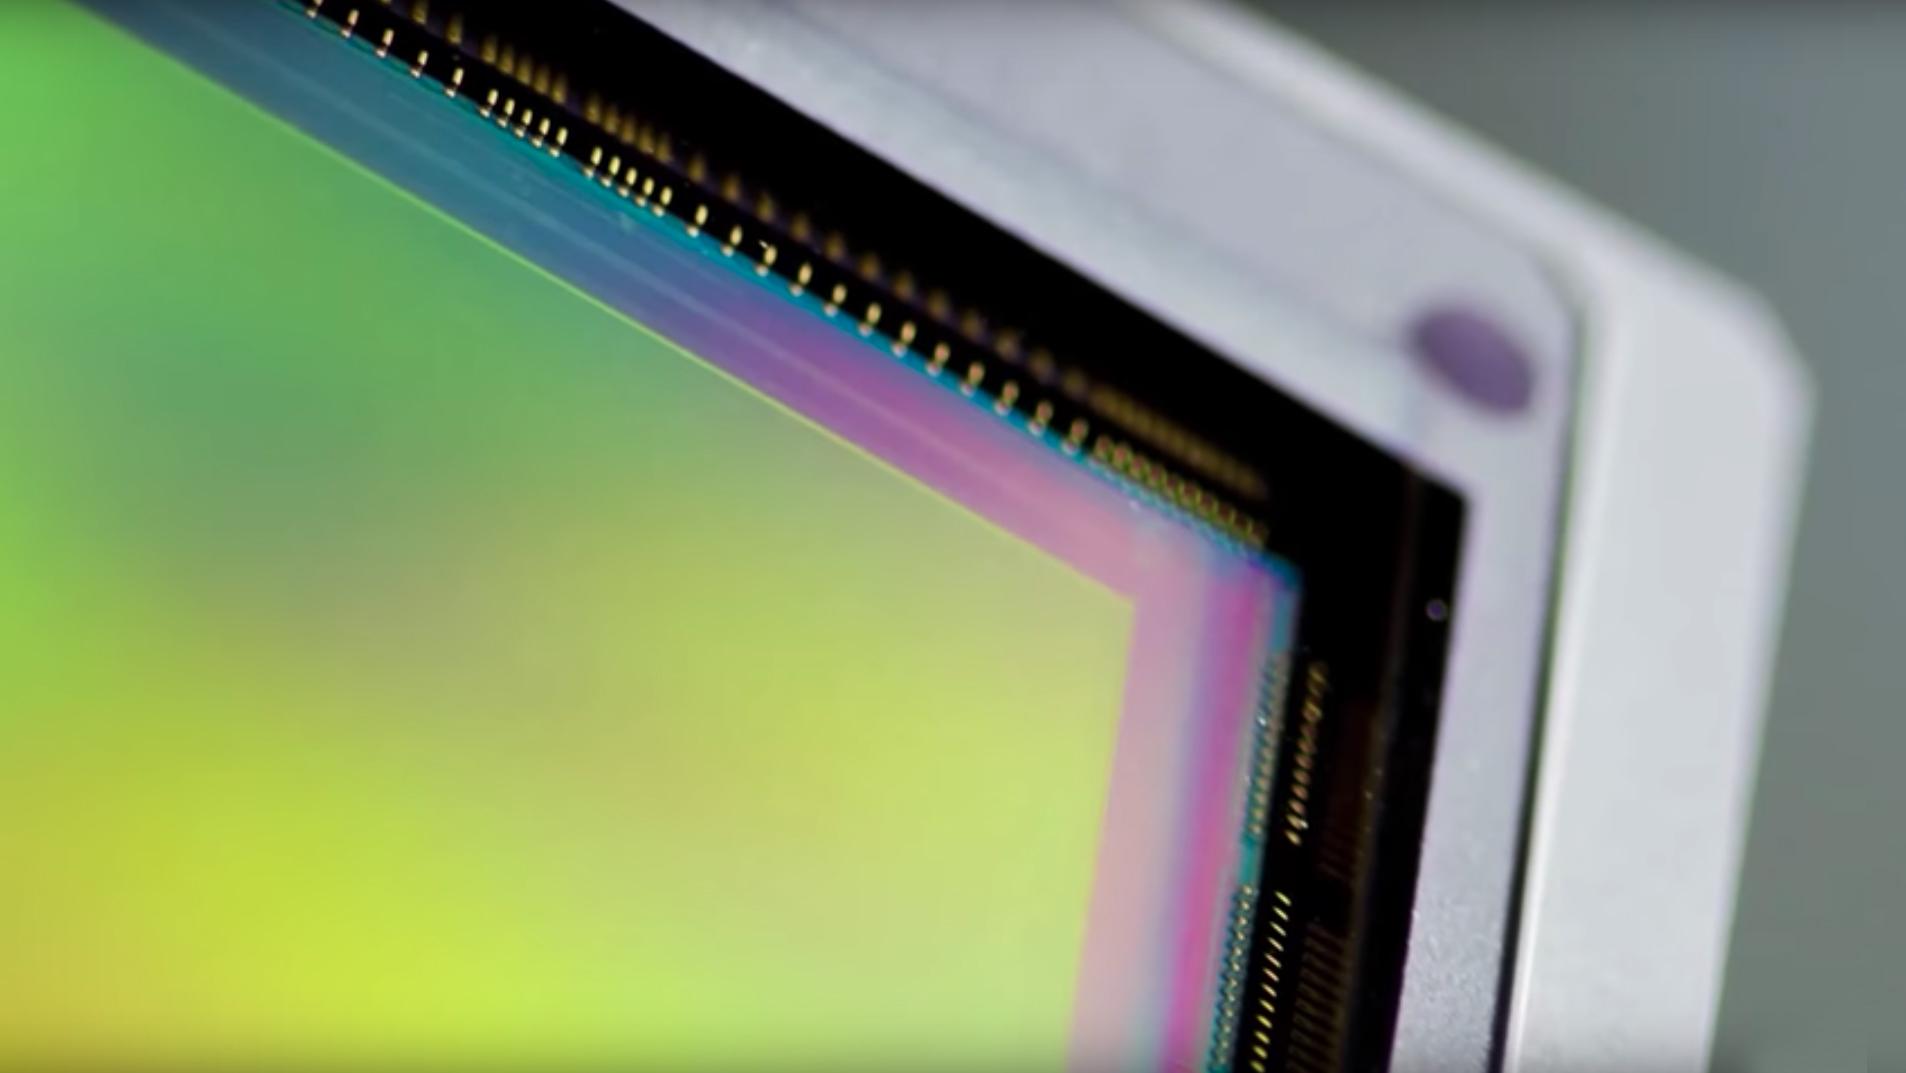 Close-up of a Canon image sensor